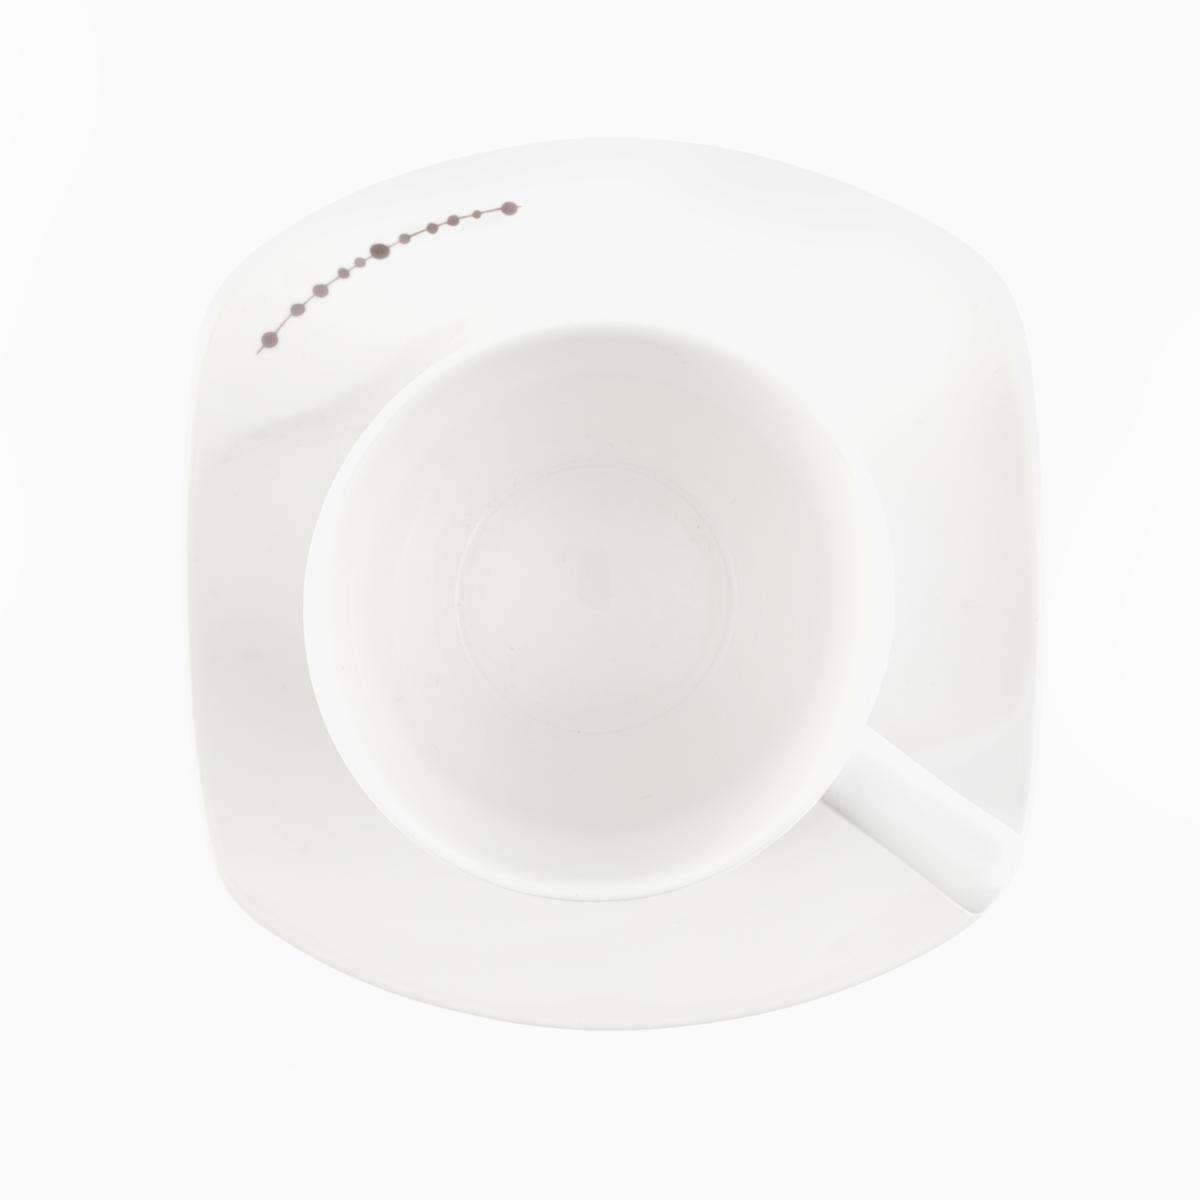 Coffee Saucer - Organic Pearl